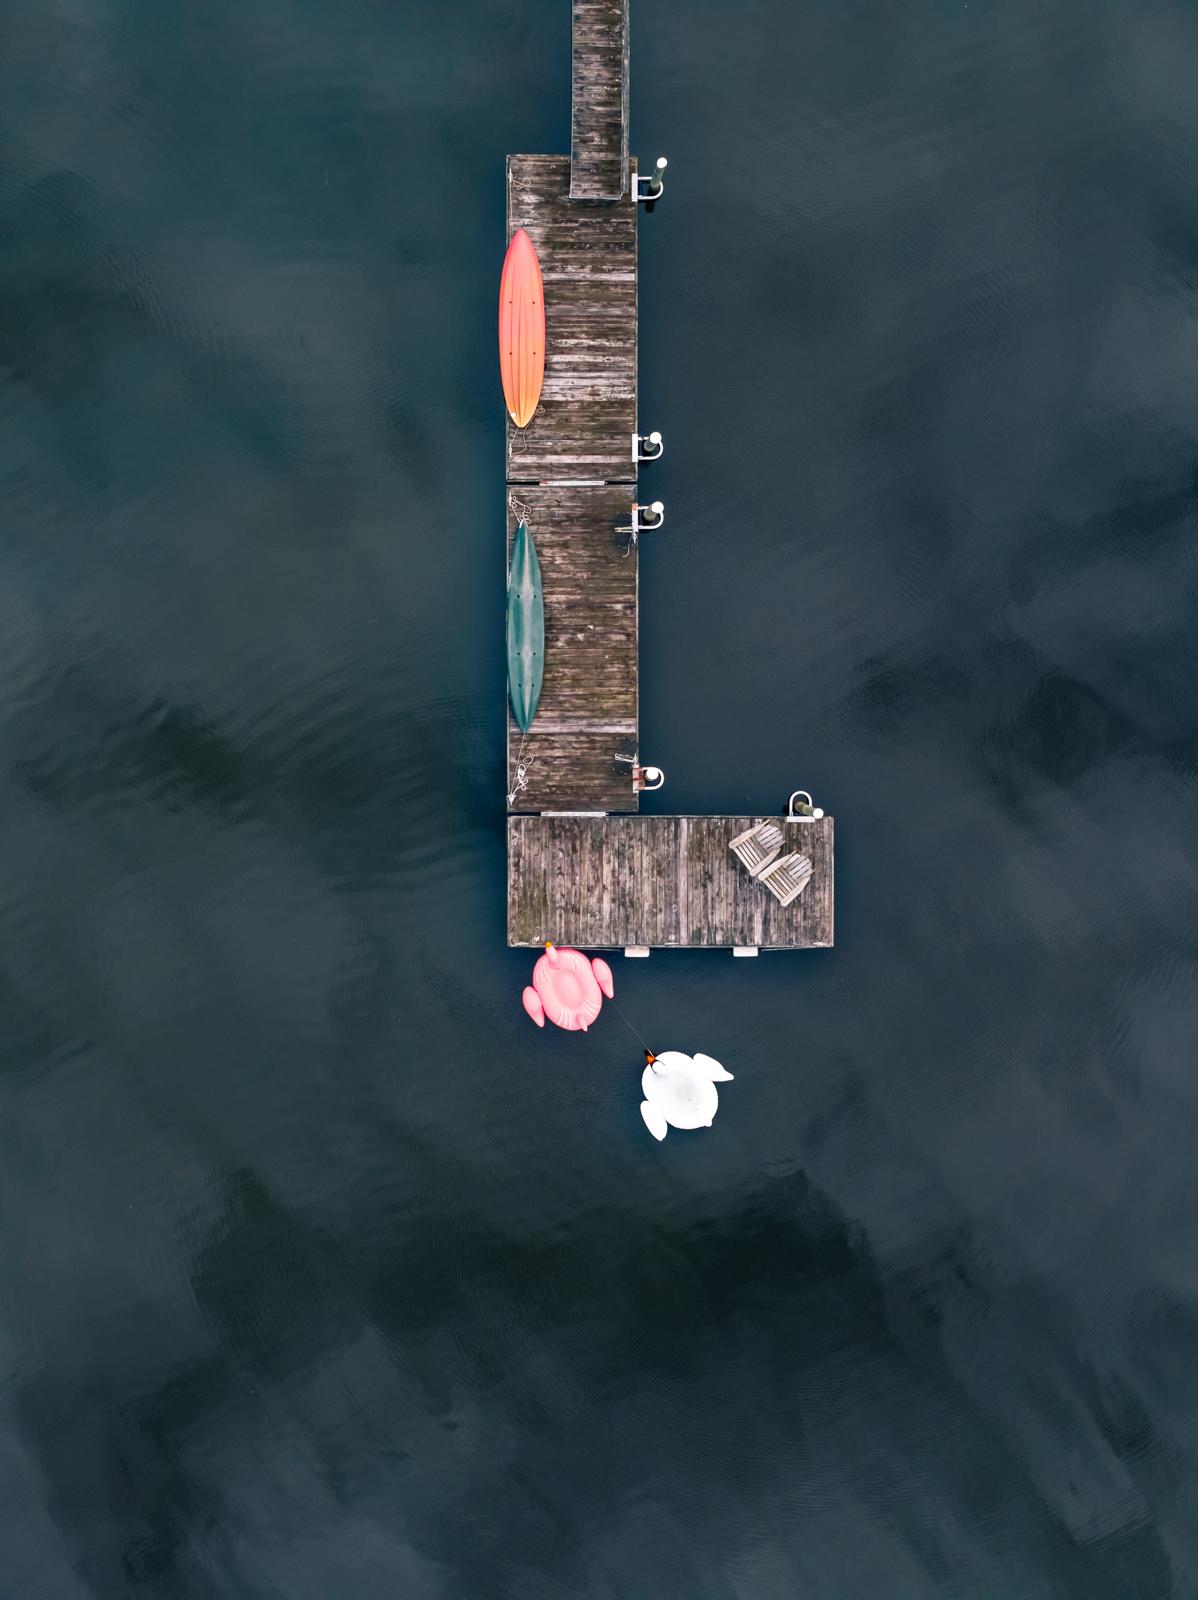 swanflamango_typoland_aerial.jpg